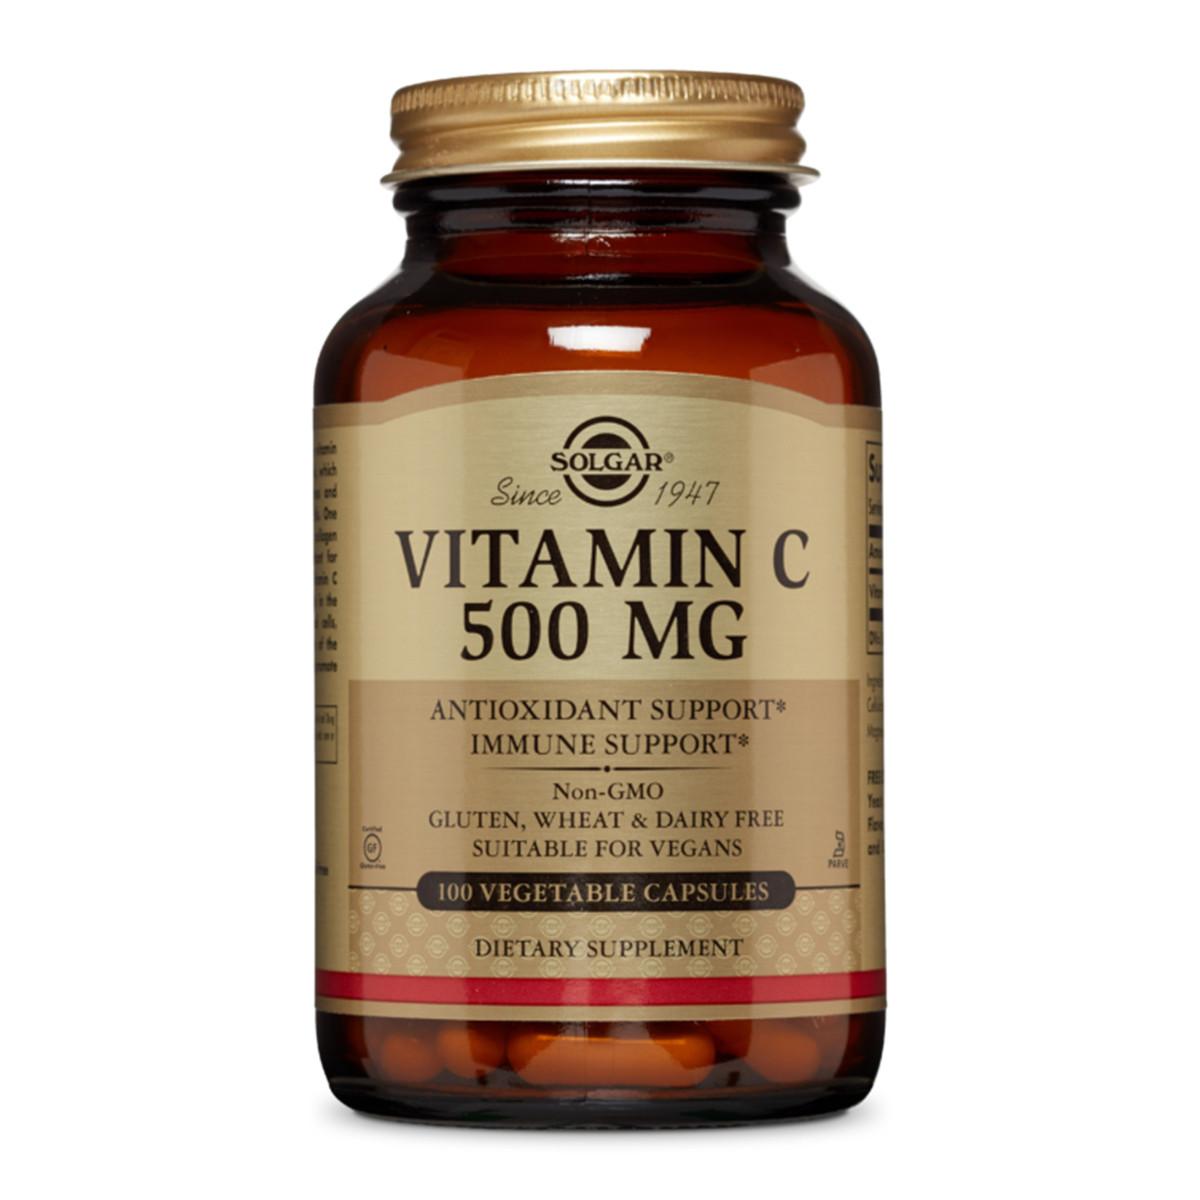 Витамин C, 500 мг, Vitamin C, 500 mg, Solgar, 100 вегетарианских капсул